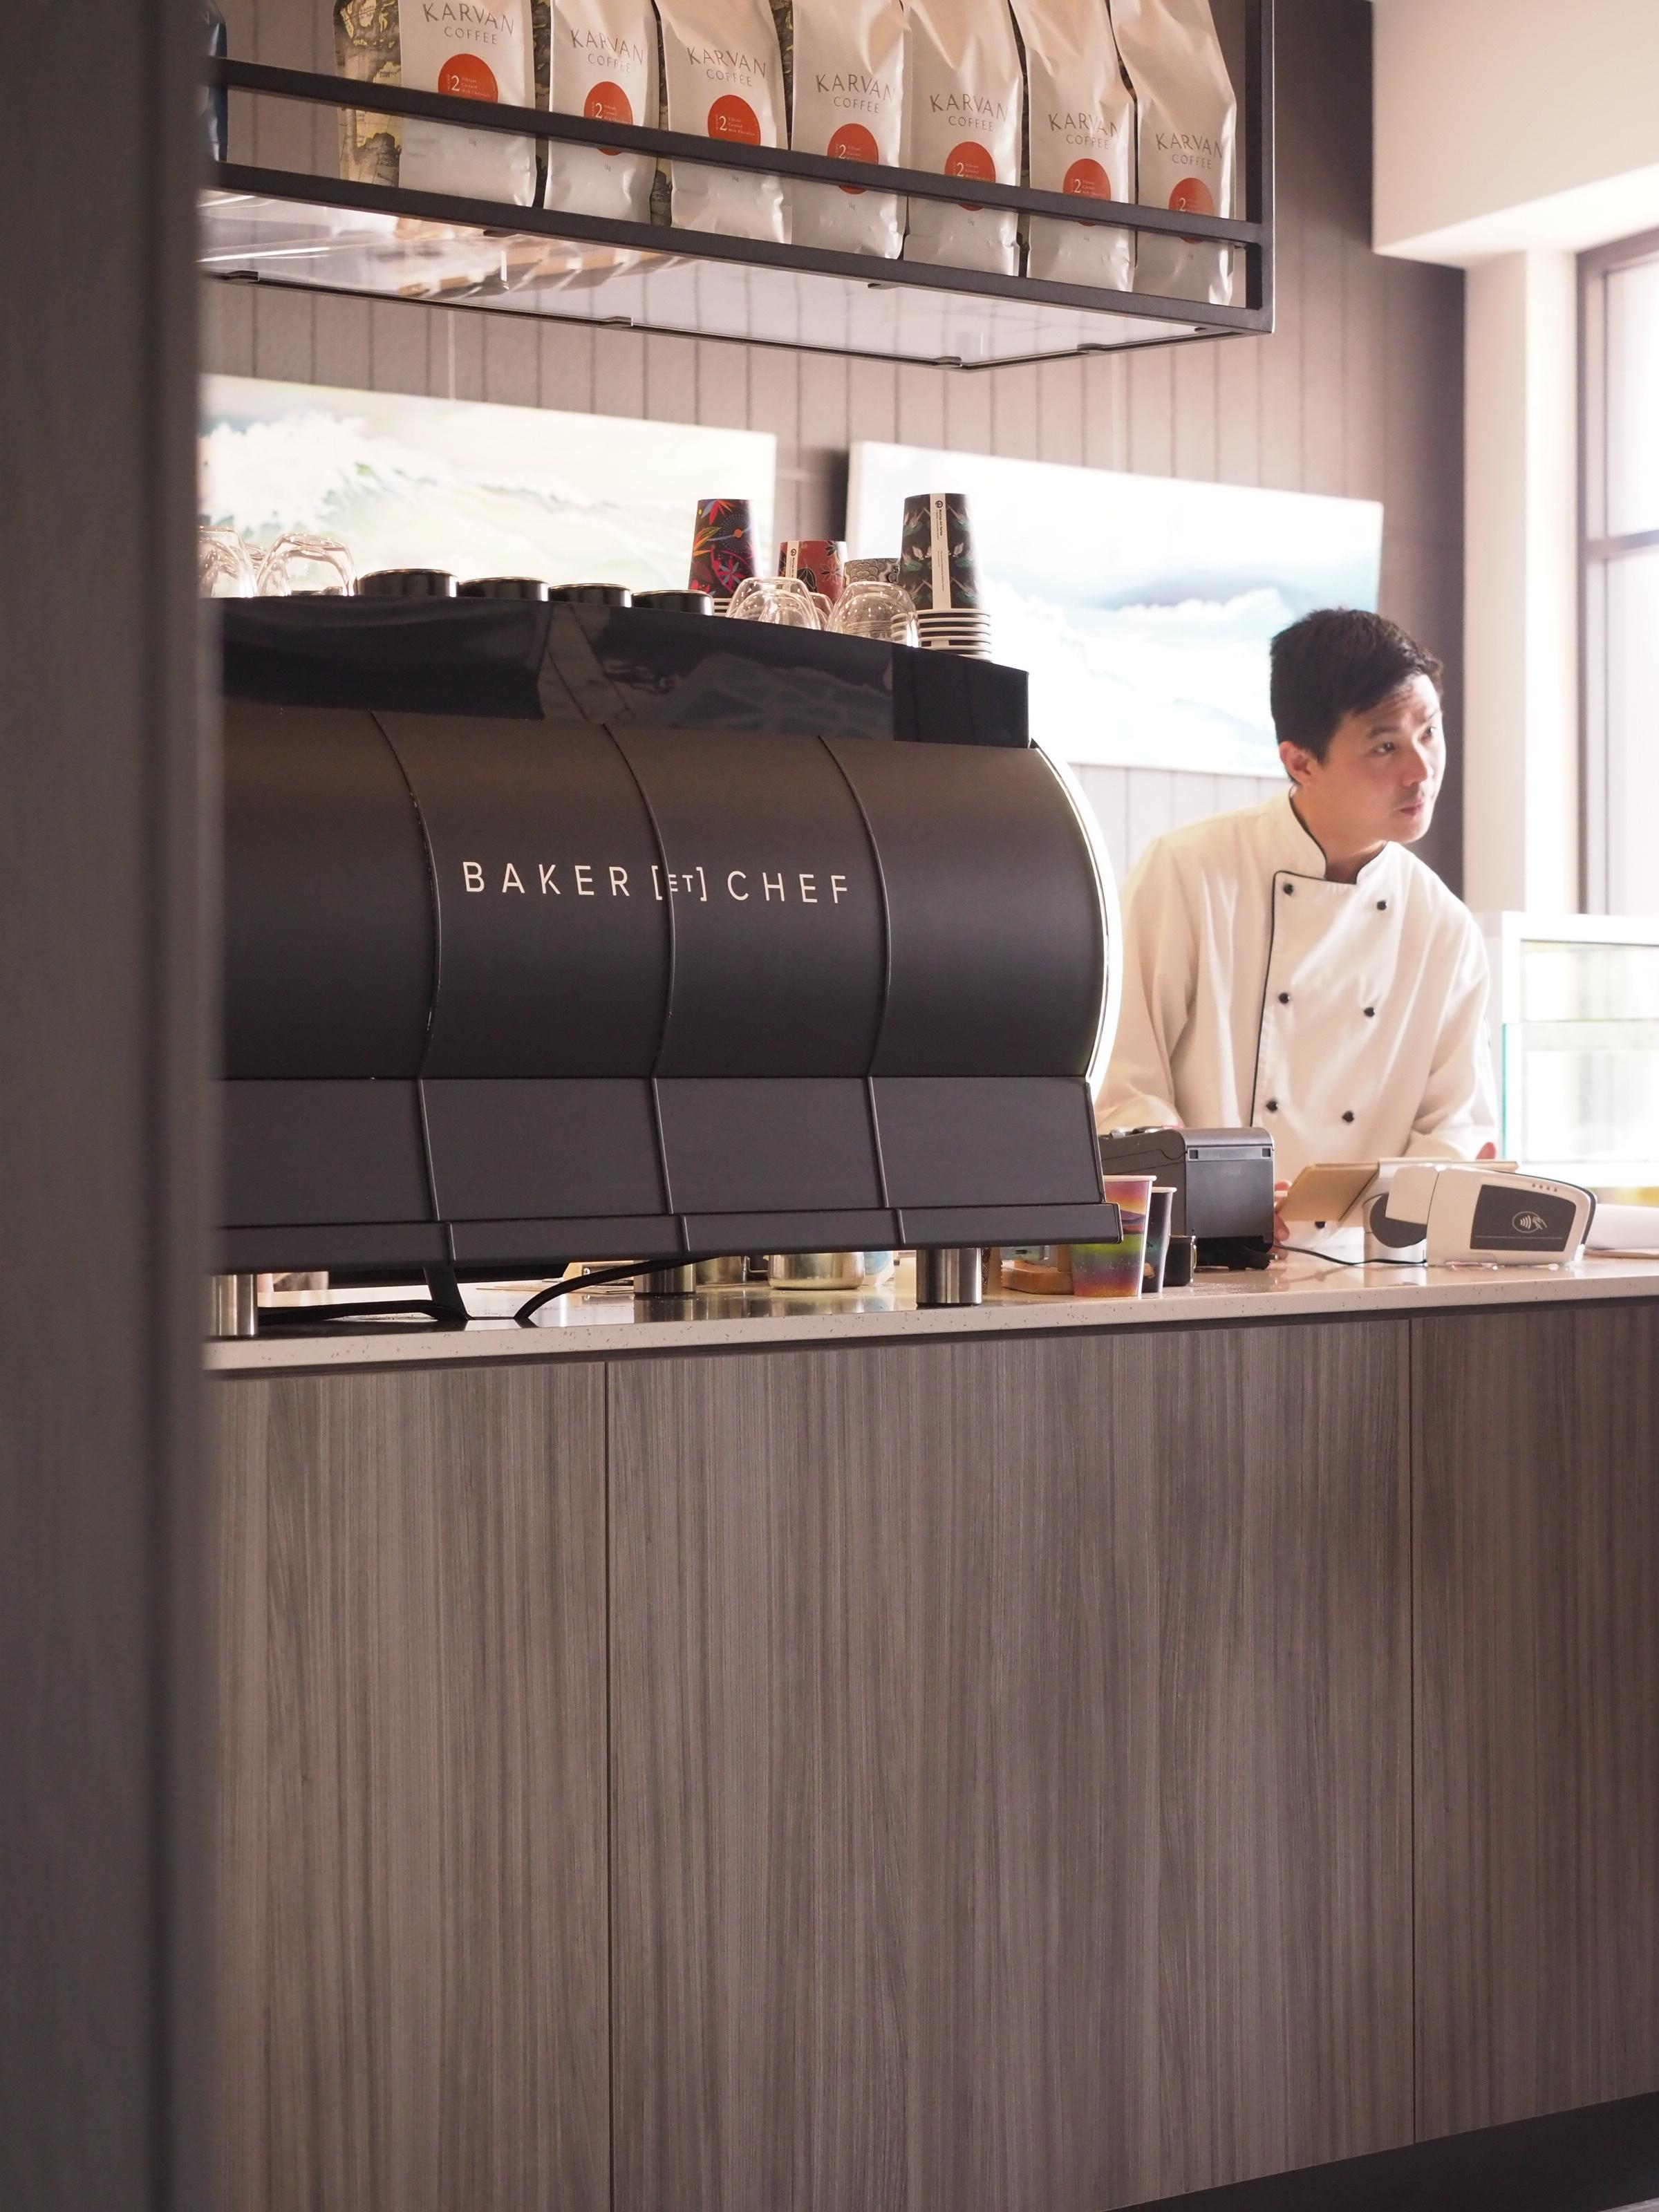 Baker et Chef opened in April 2018